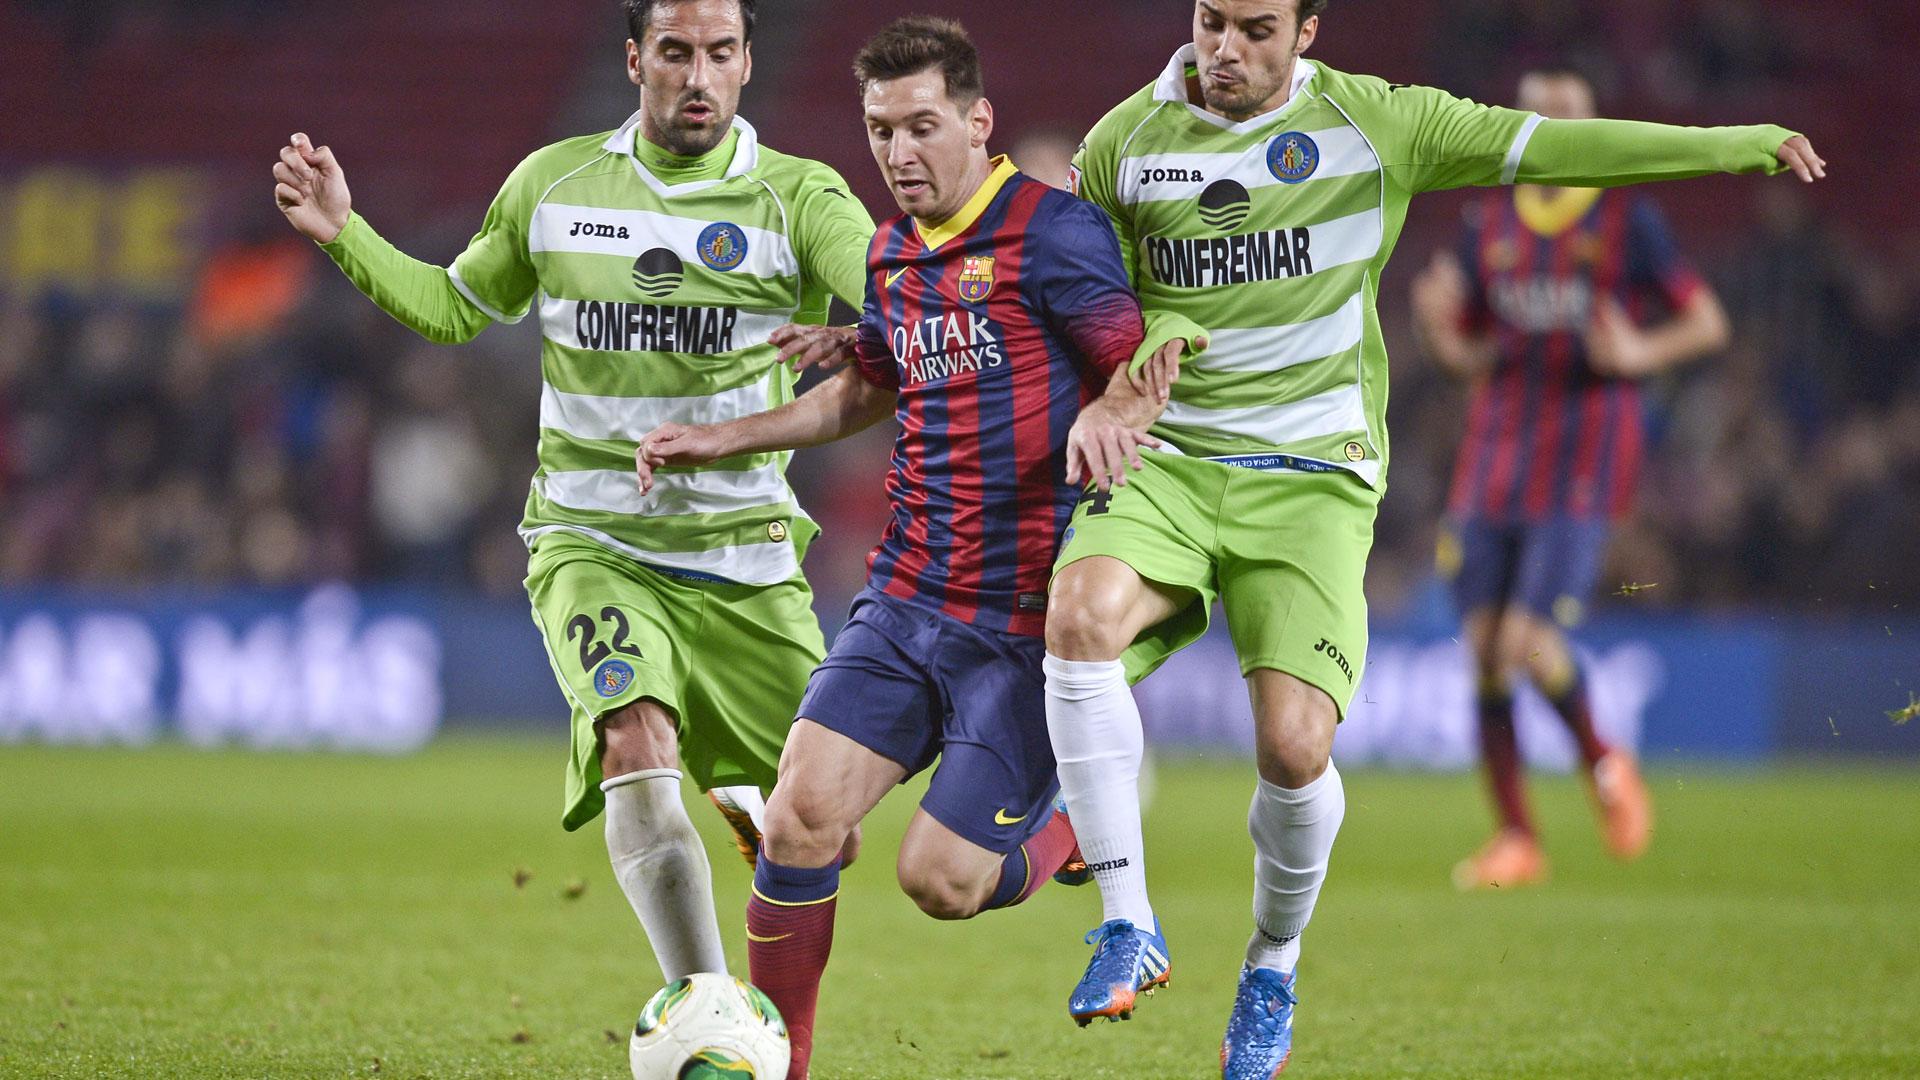 Lionel-Messi2-010914-AP-FTR.jpg